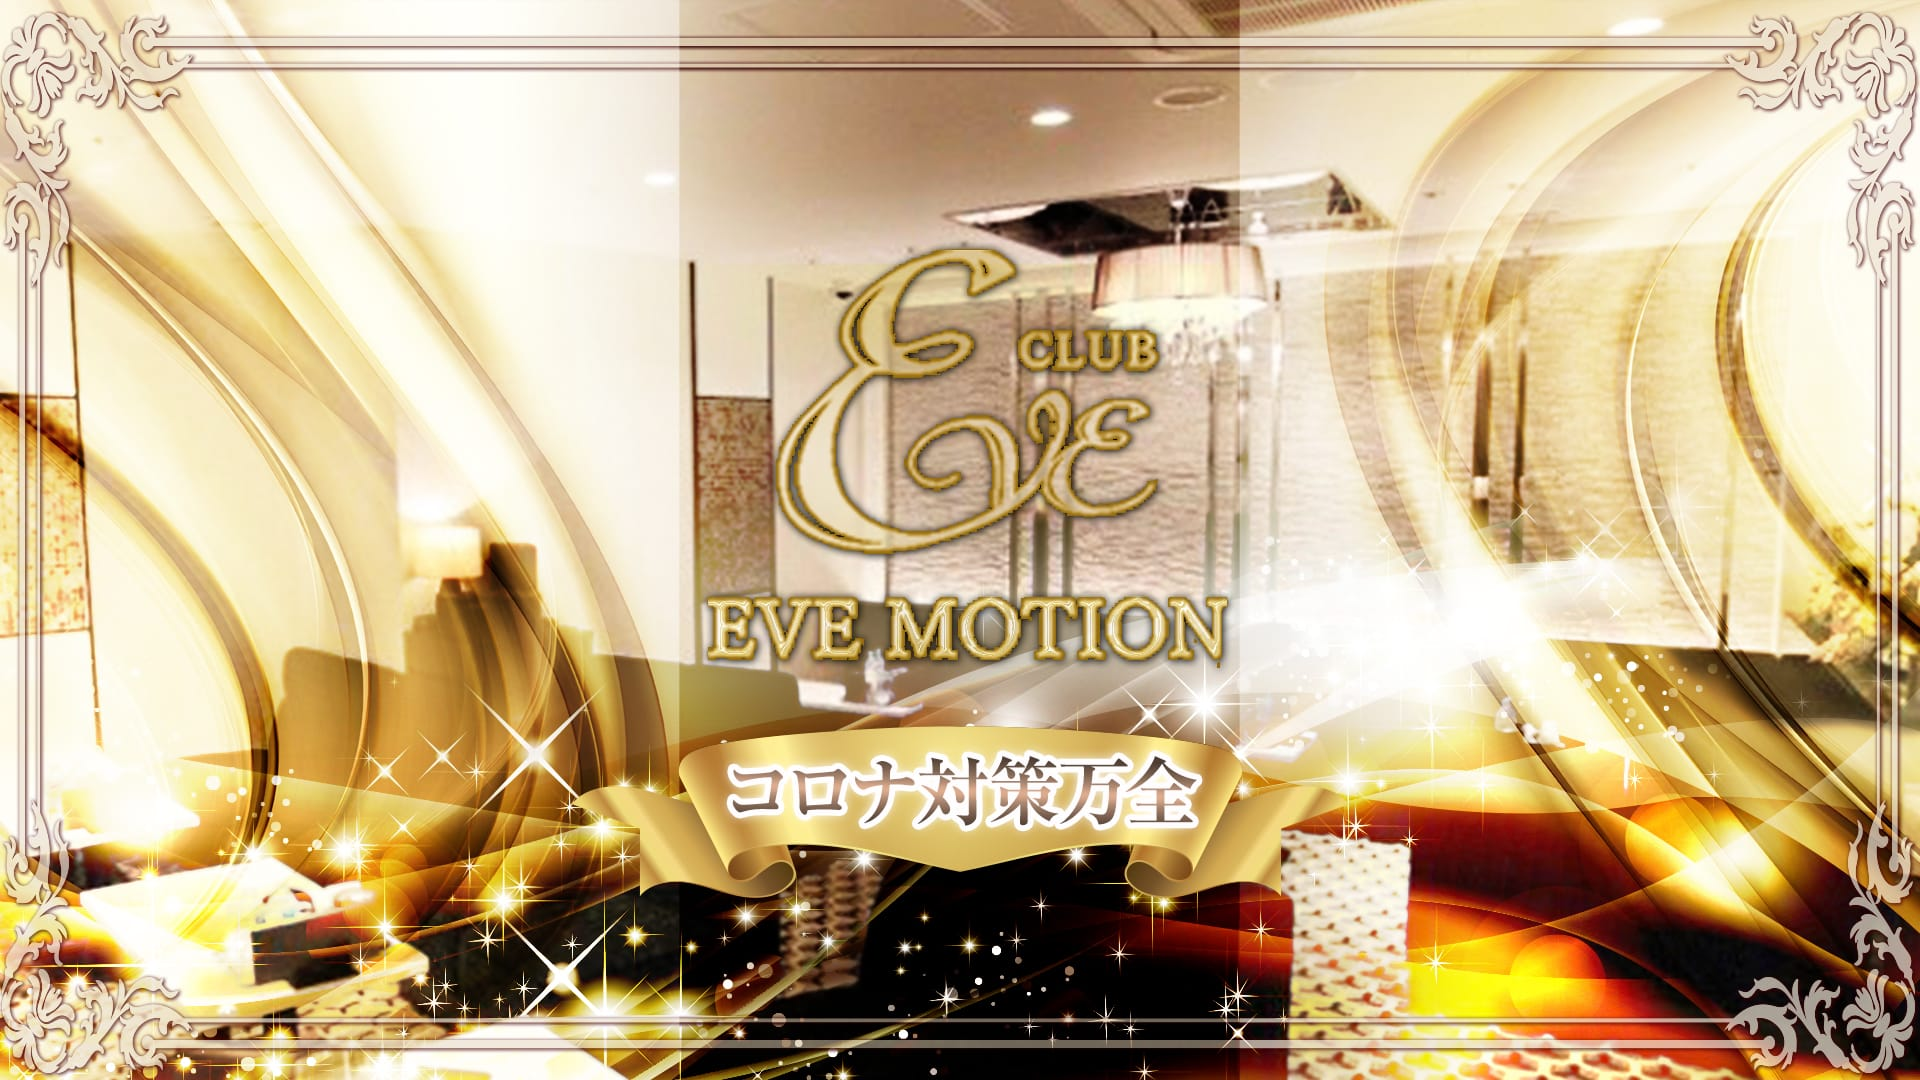 CLUB EVE MOTION(エヴァモーション) 北新地キャバクラ TOP画像